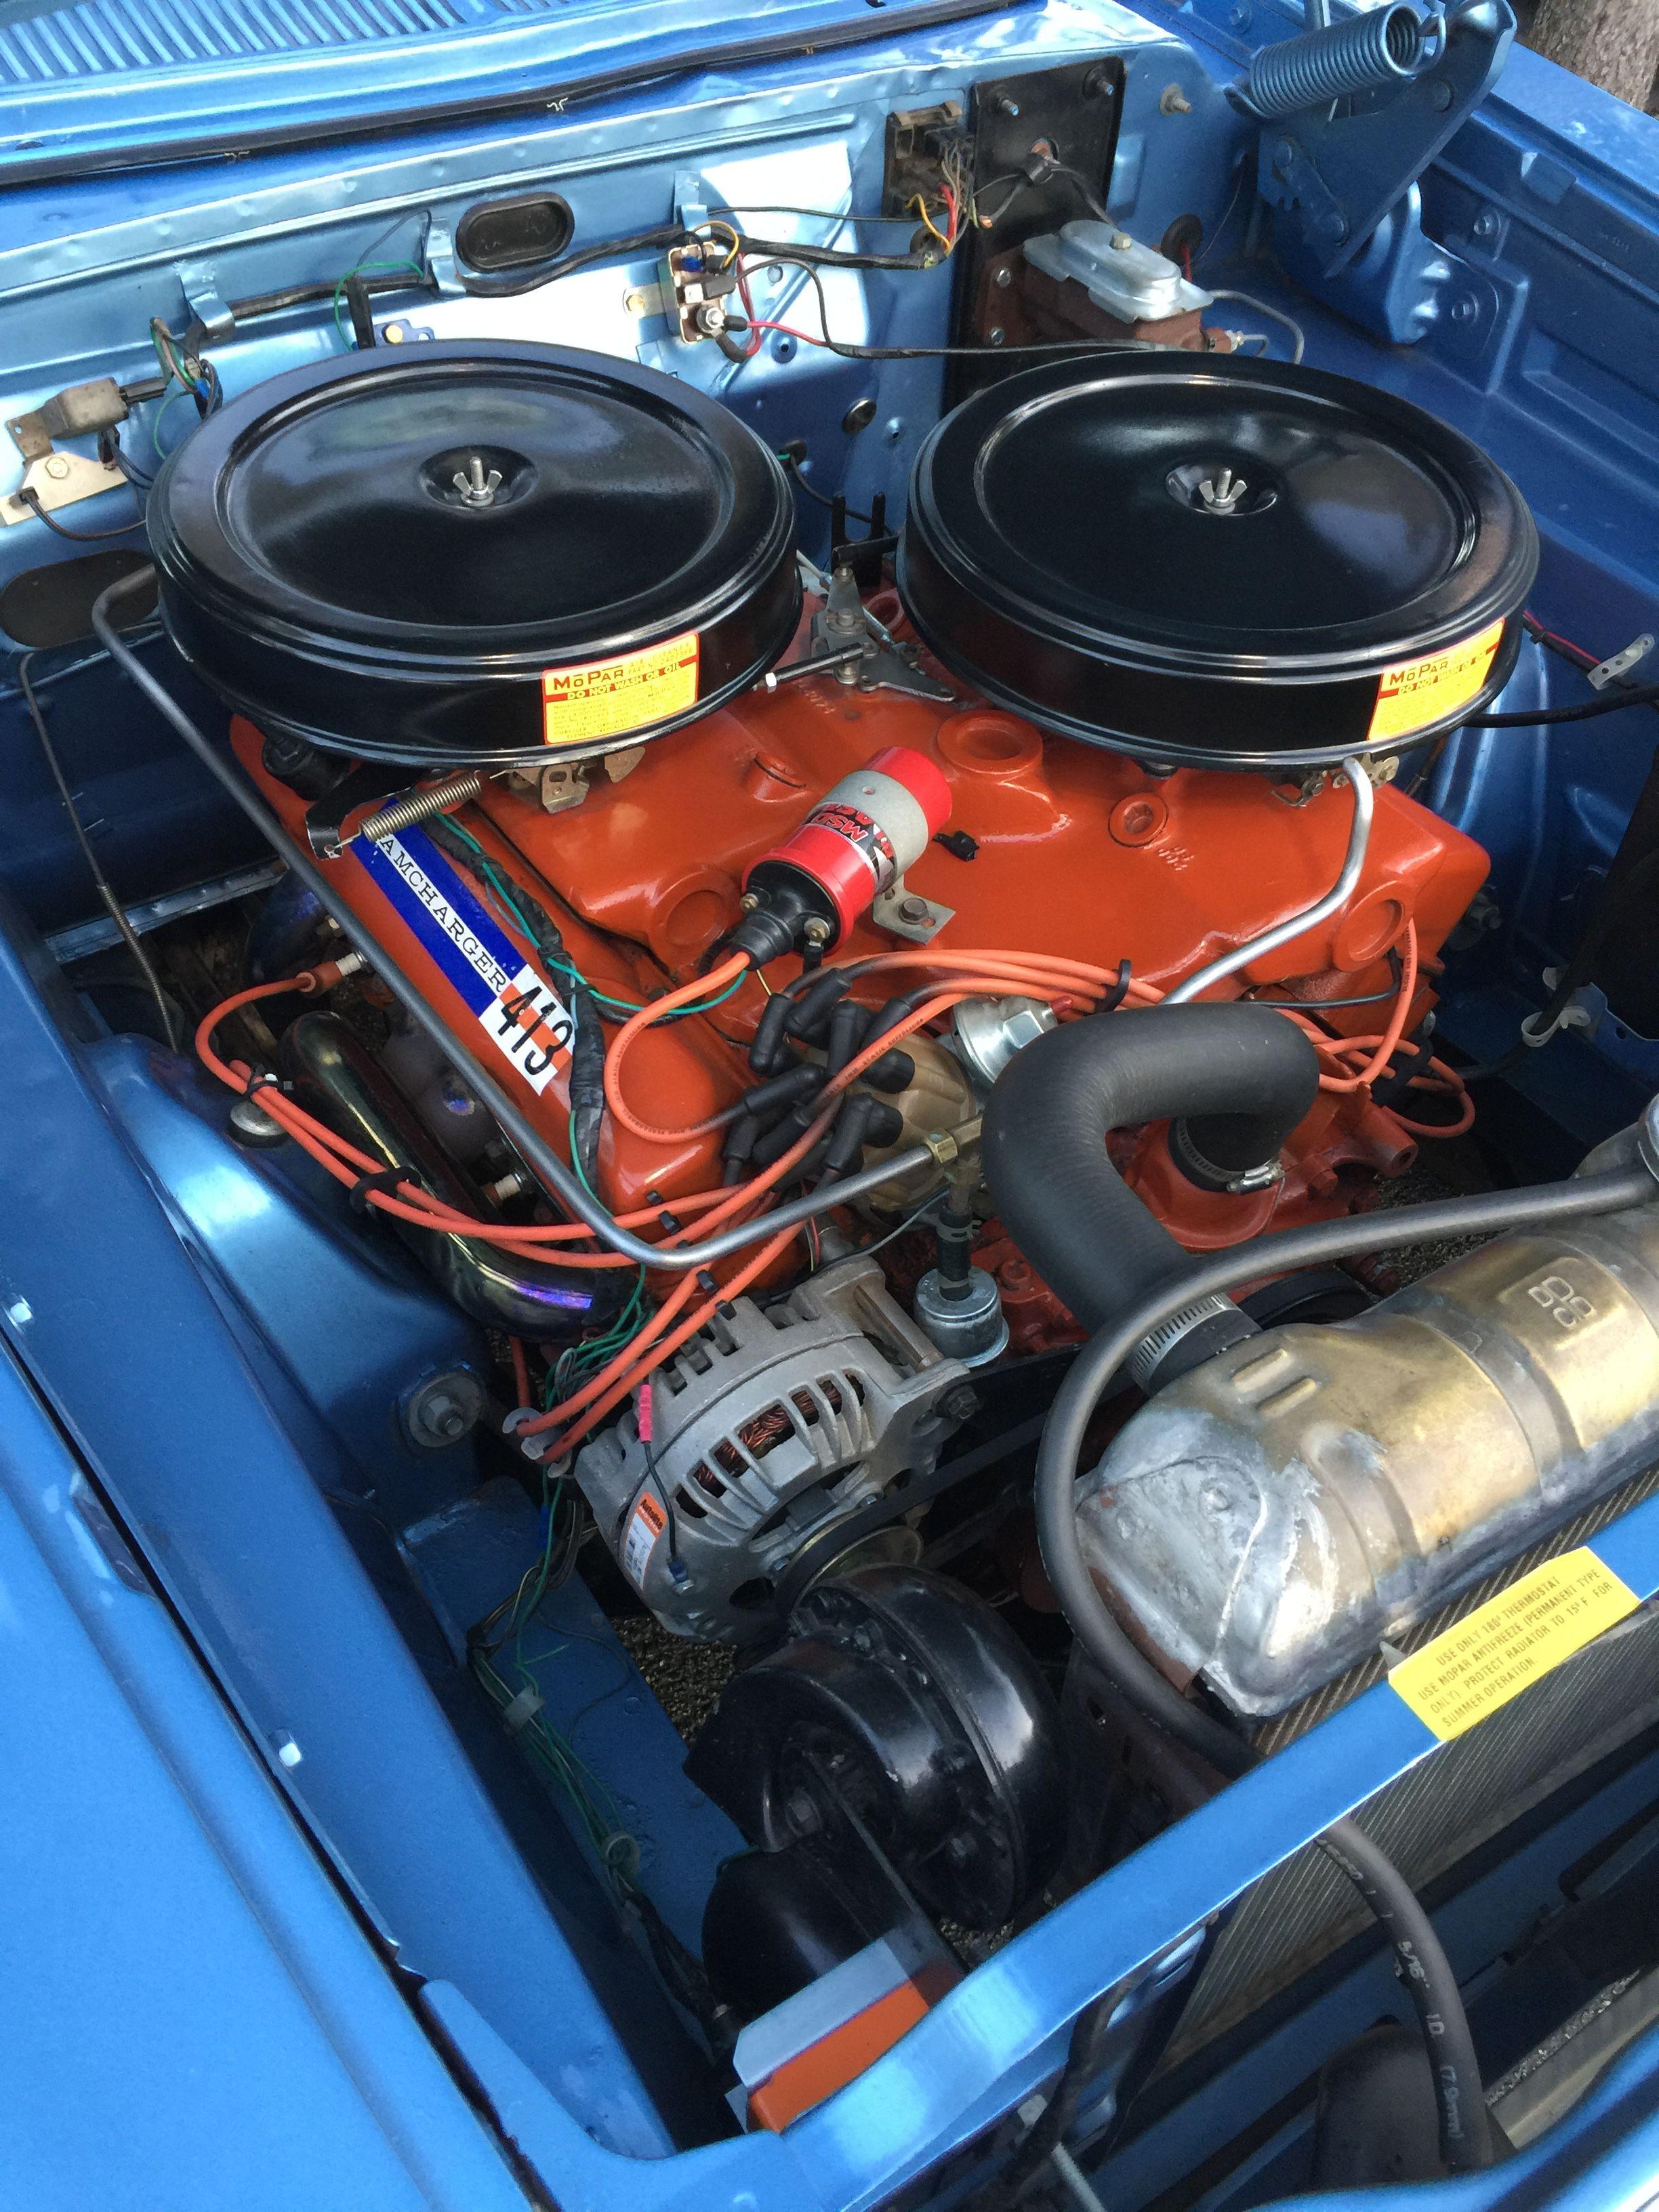 Pin By Tim W Marshall On Engines Dream Cars V8 Engine Bone Stock